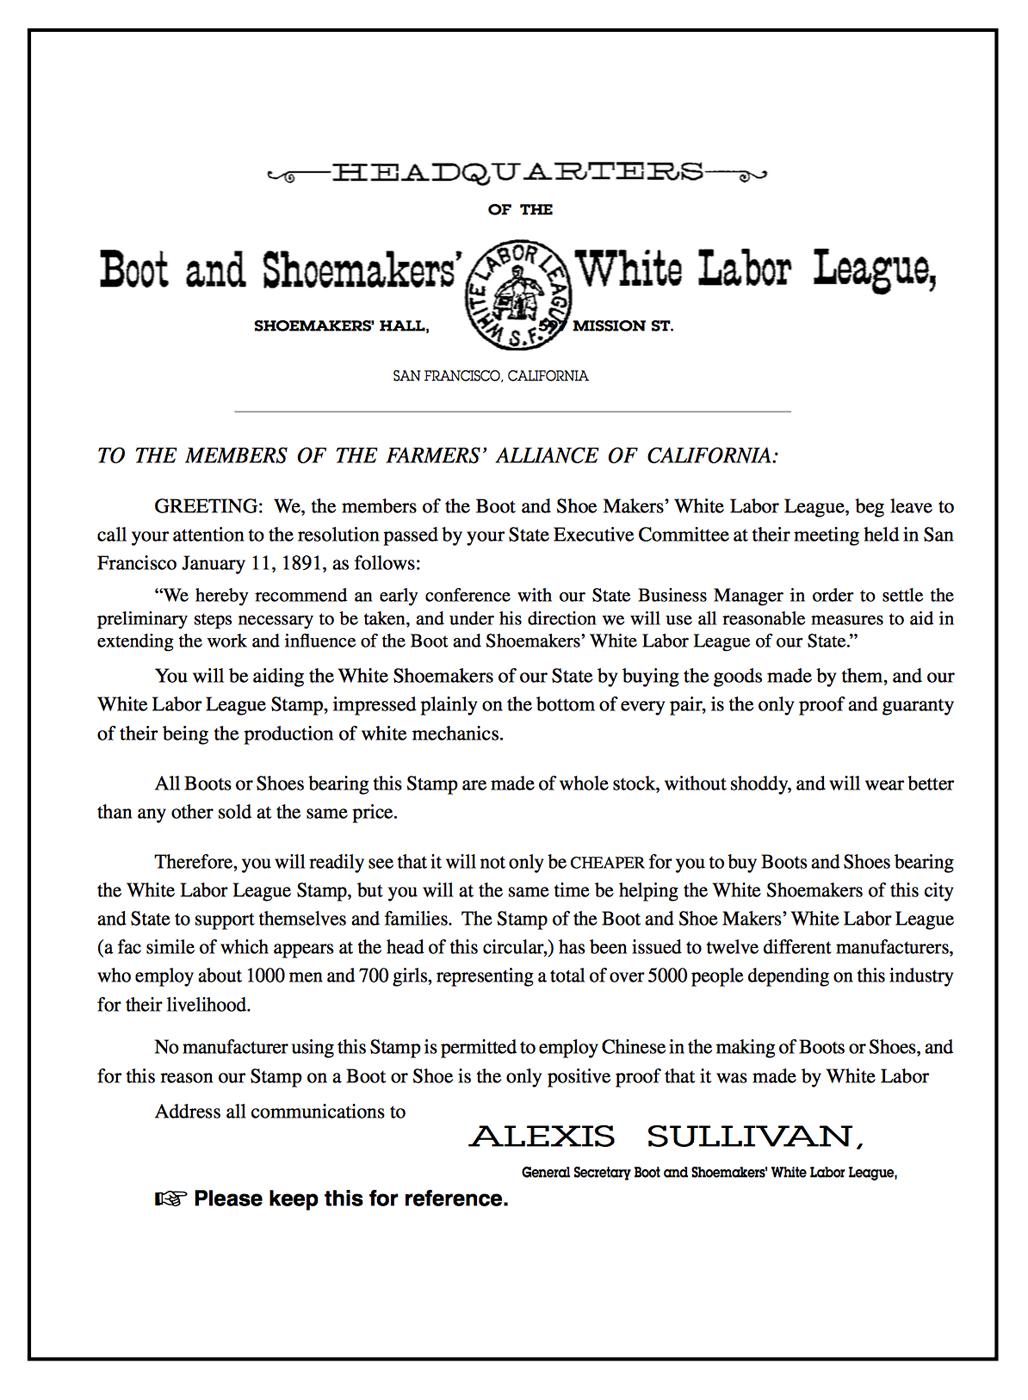 White Labor League